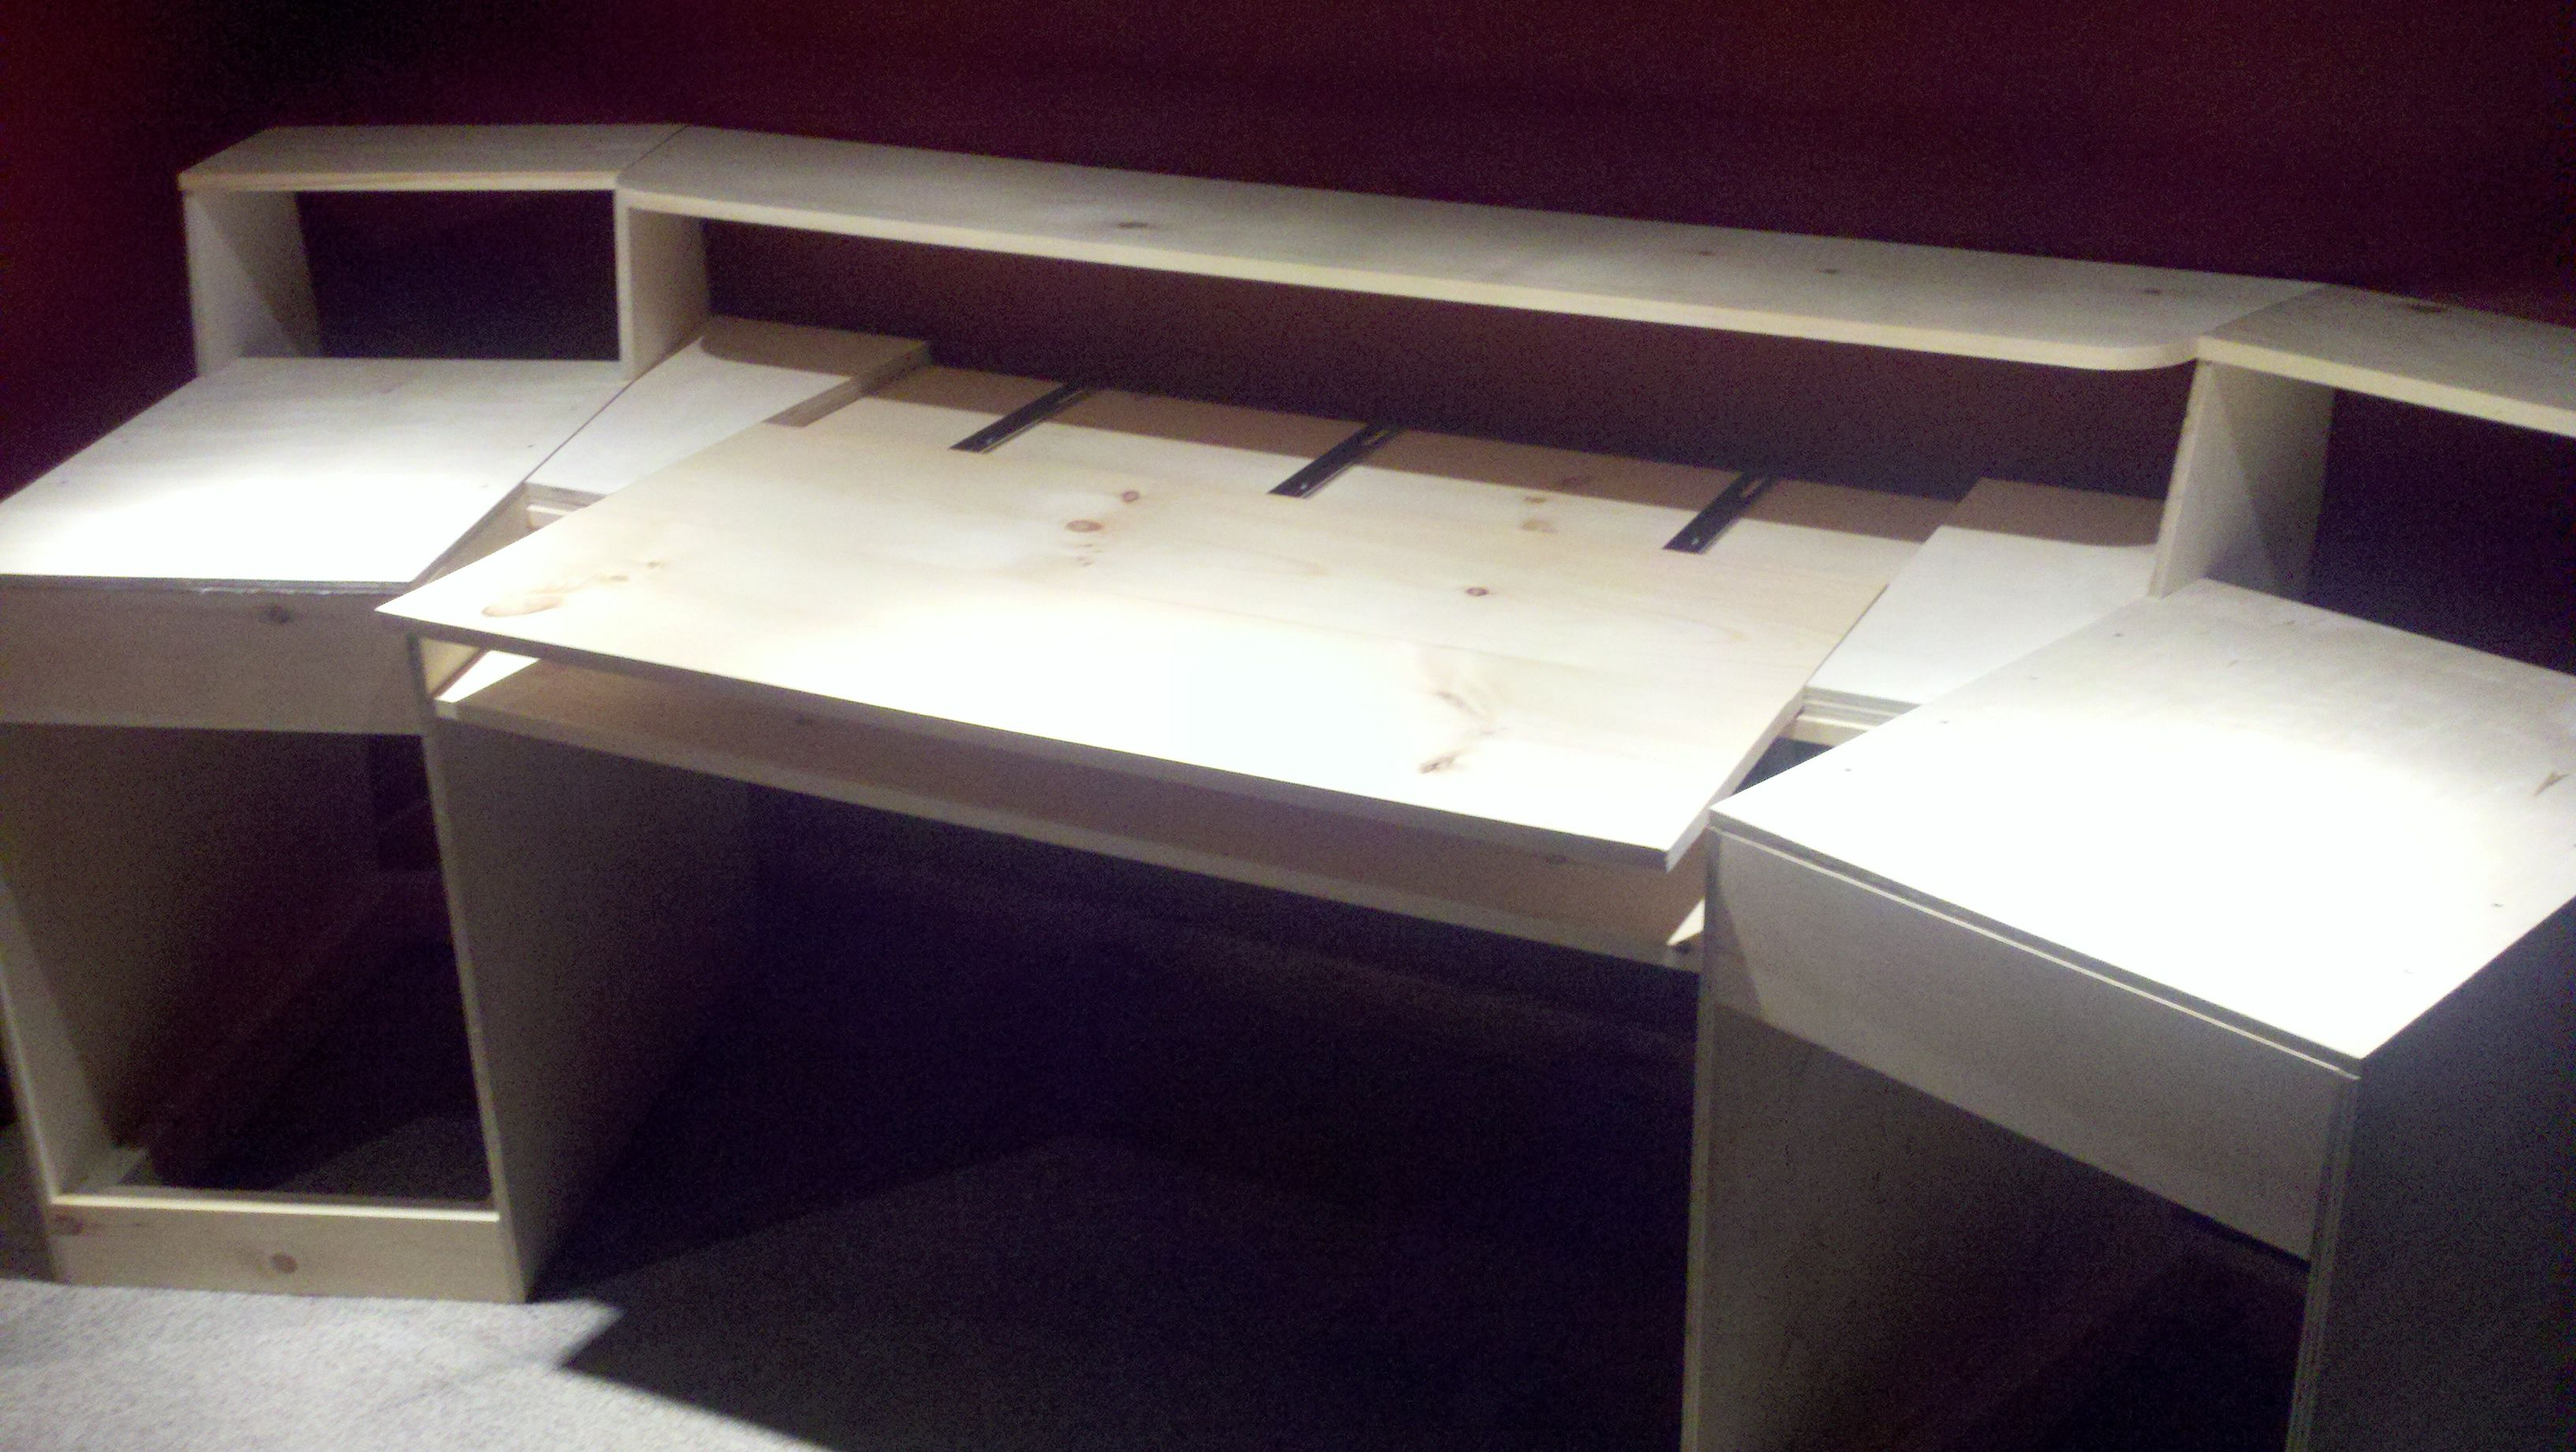 Woodworking plans Home Studio Desk Plans free download Home studio